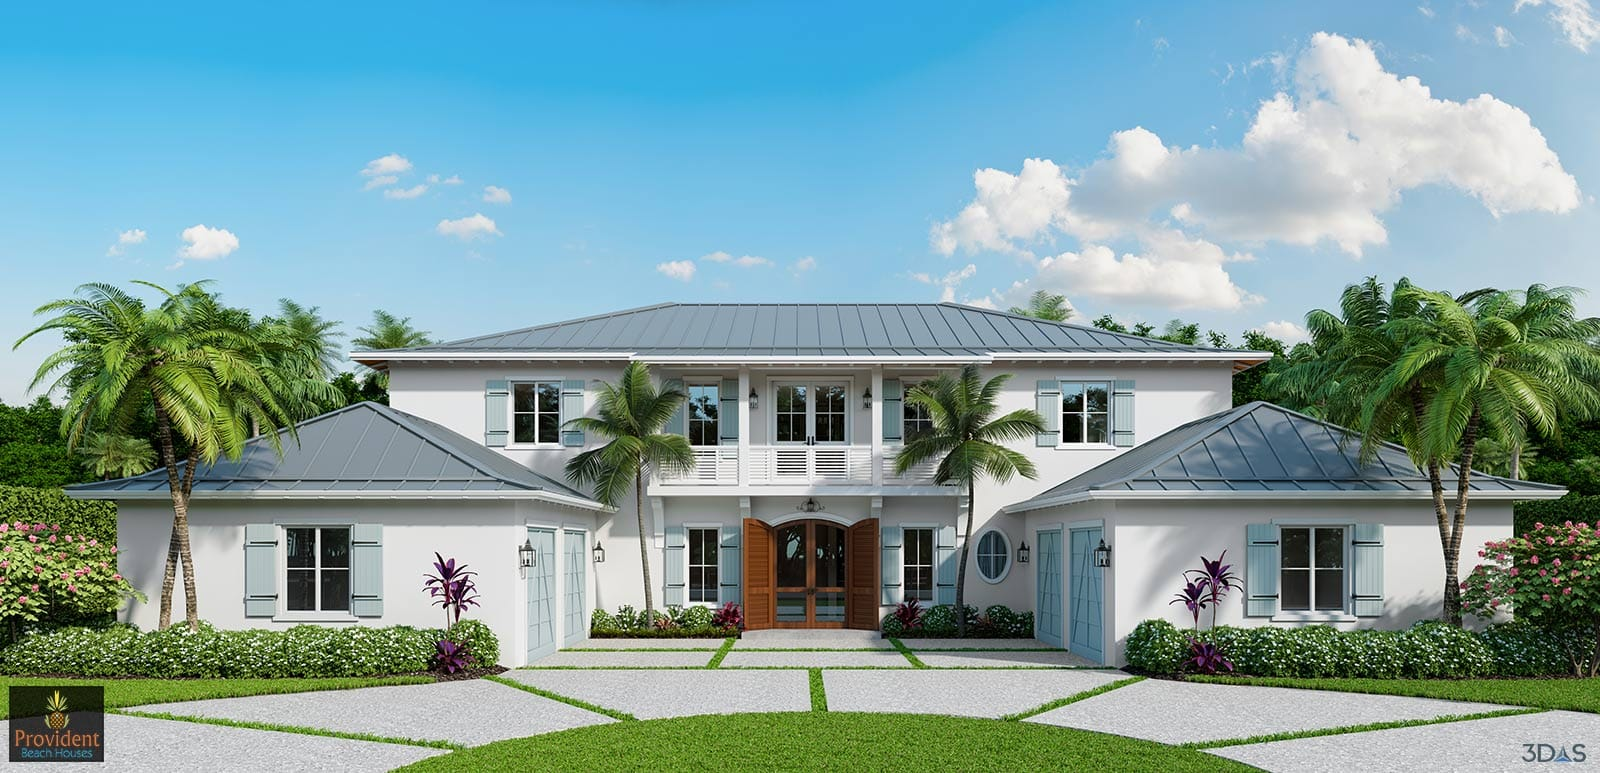 3D Elevation Front Residential 3D Rendering - Crayton Road Naples, Florida